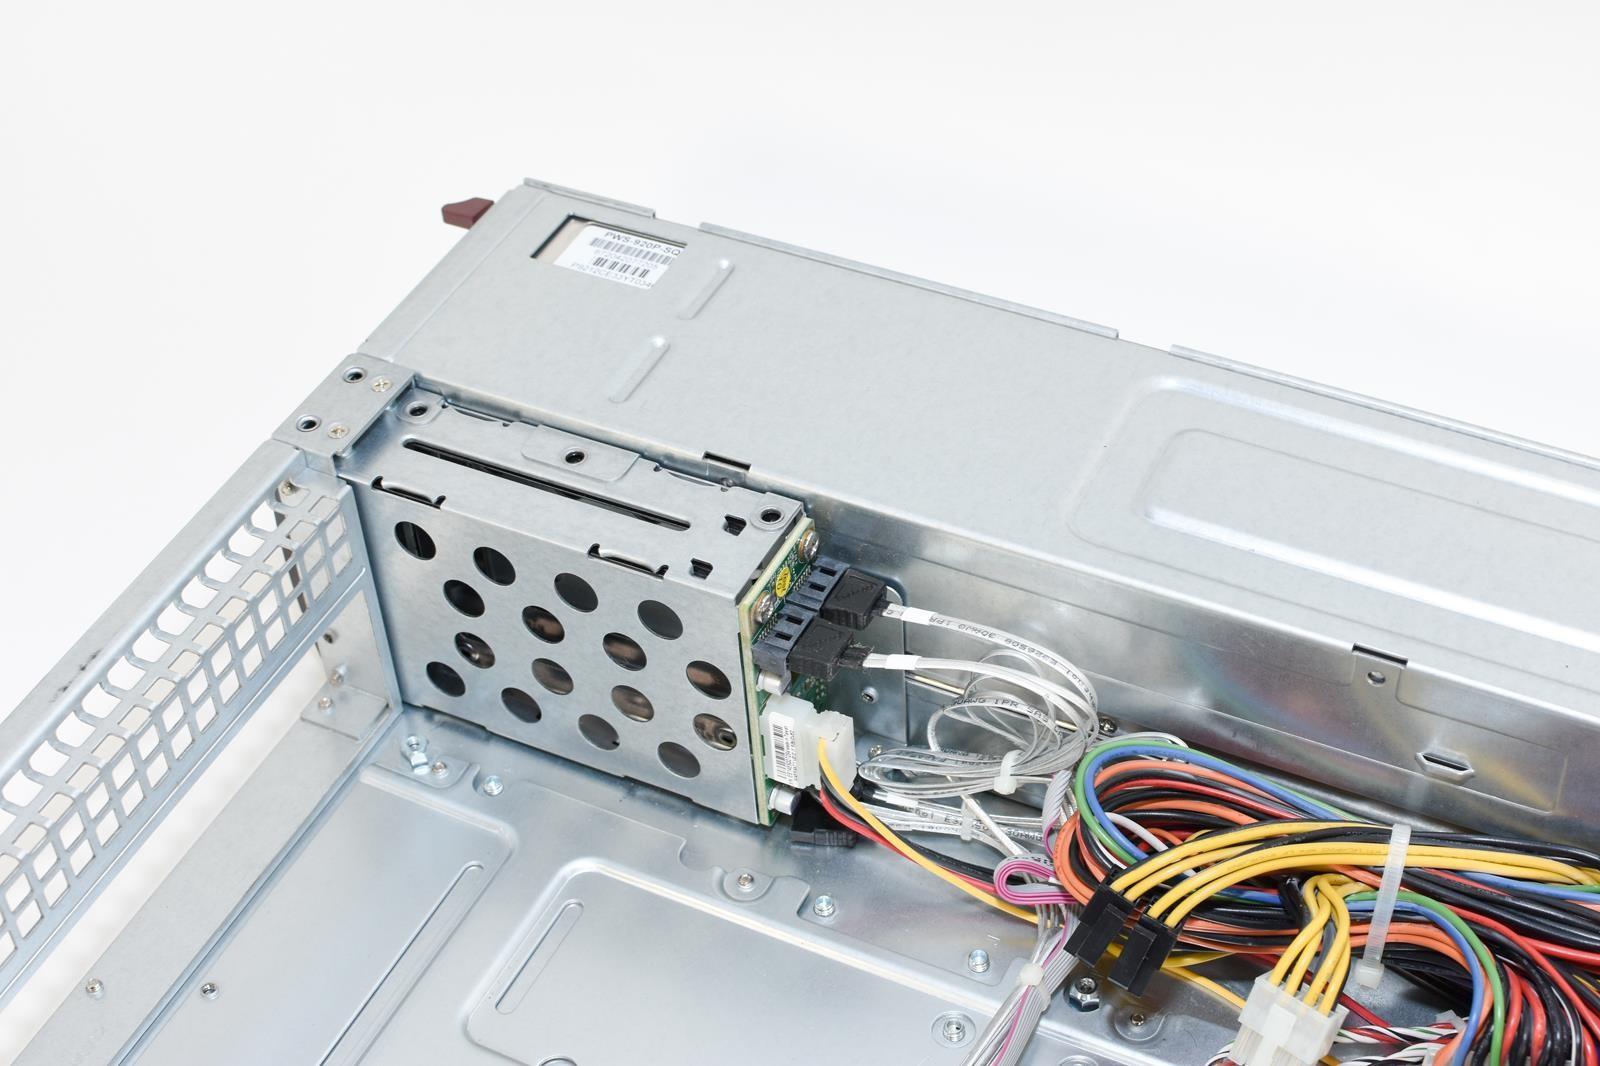 Supermicro CSE-826BE16-R920LPB 2U Server Chassis 2x 920W 12-Bay BPN